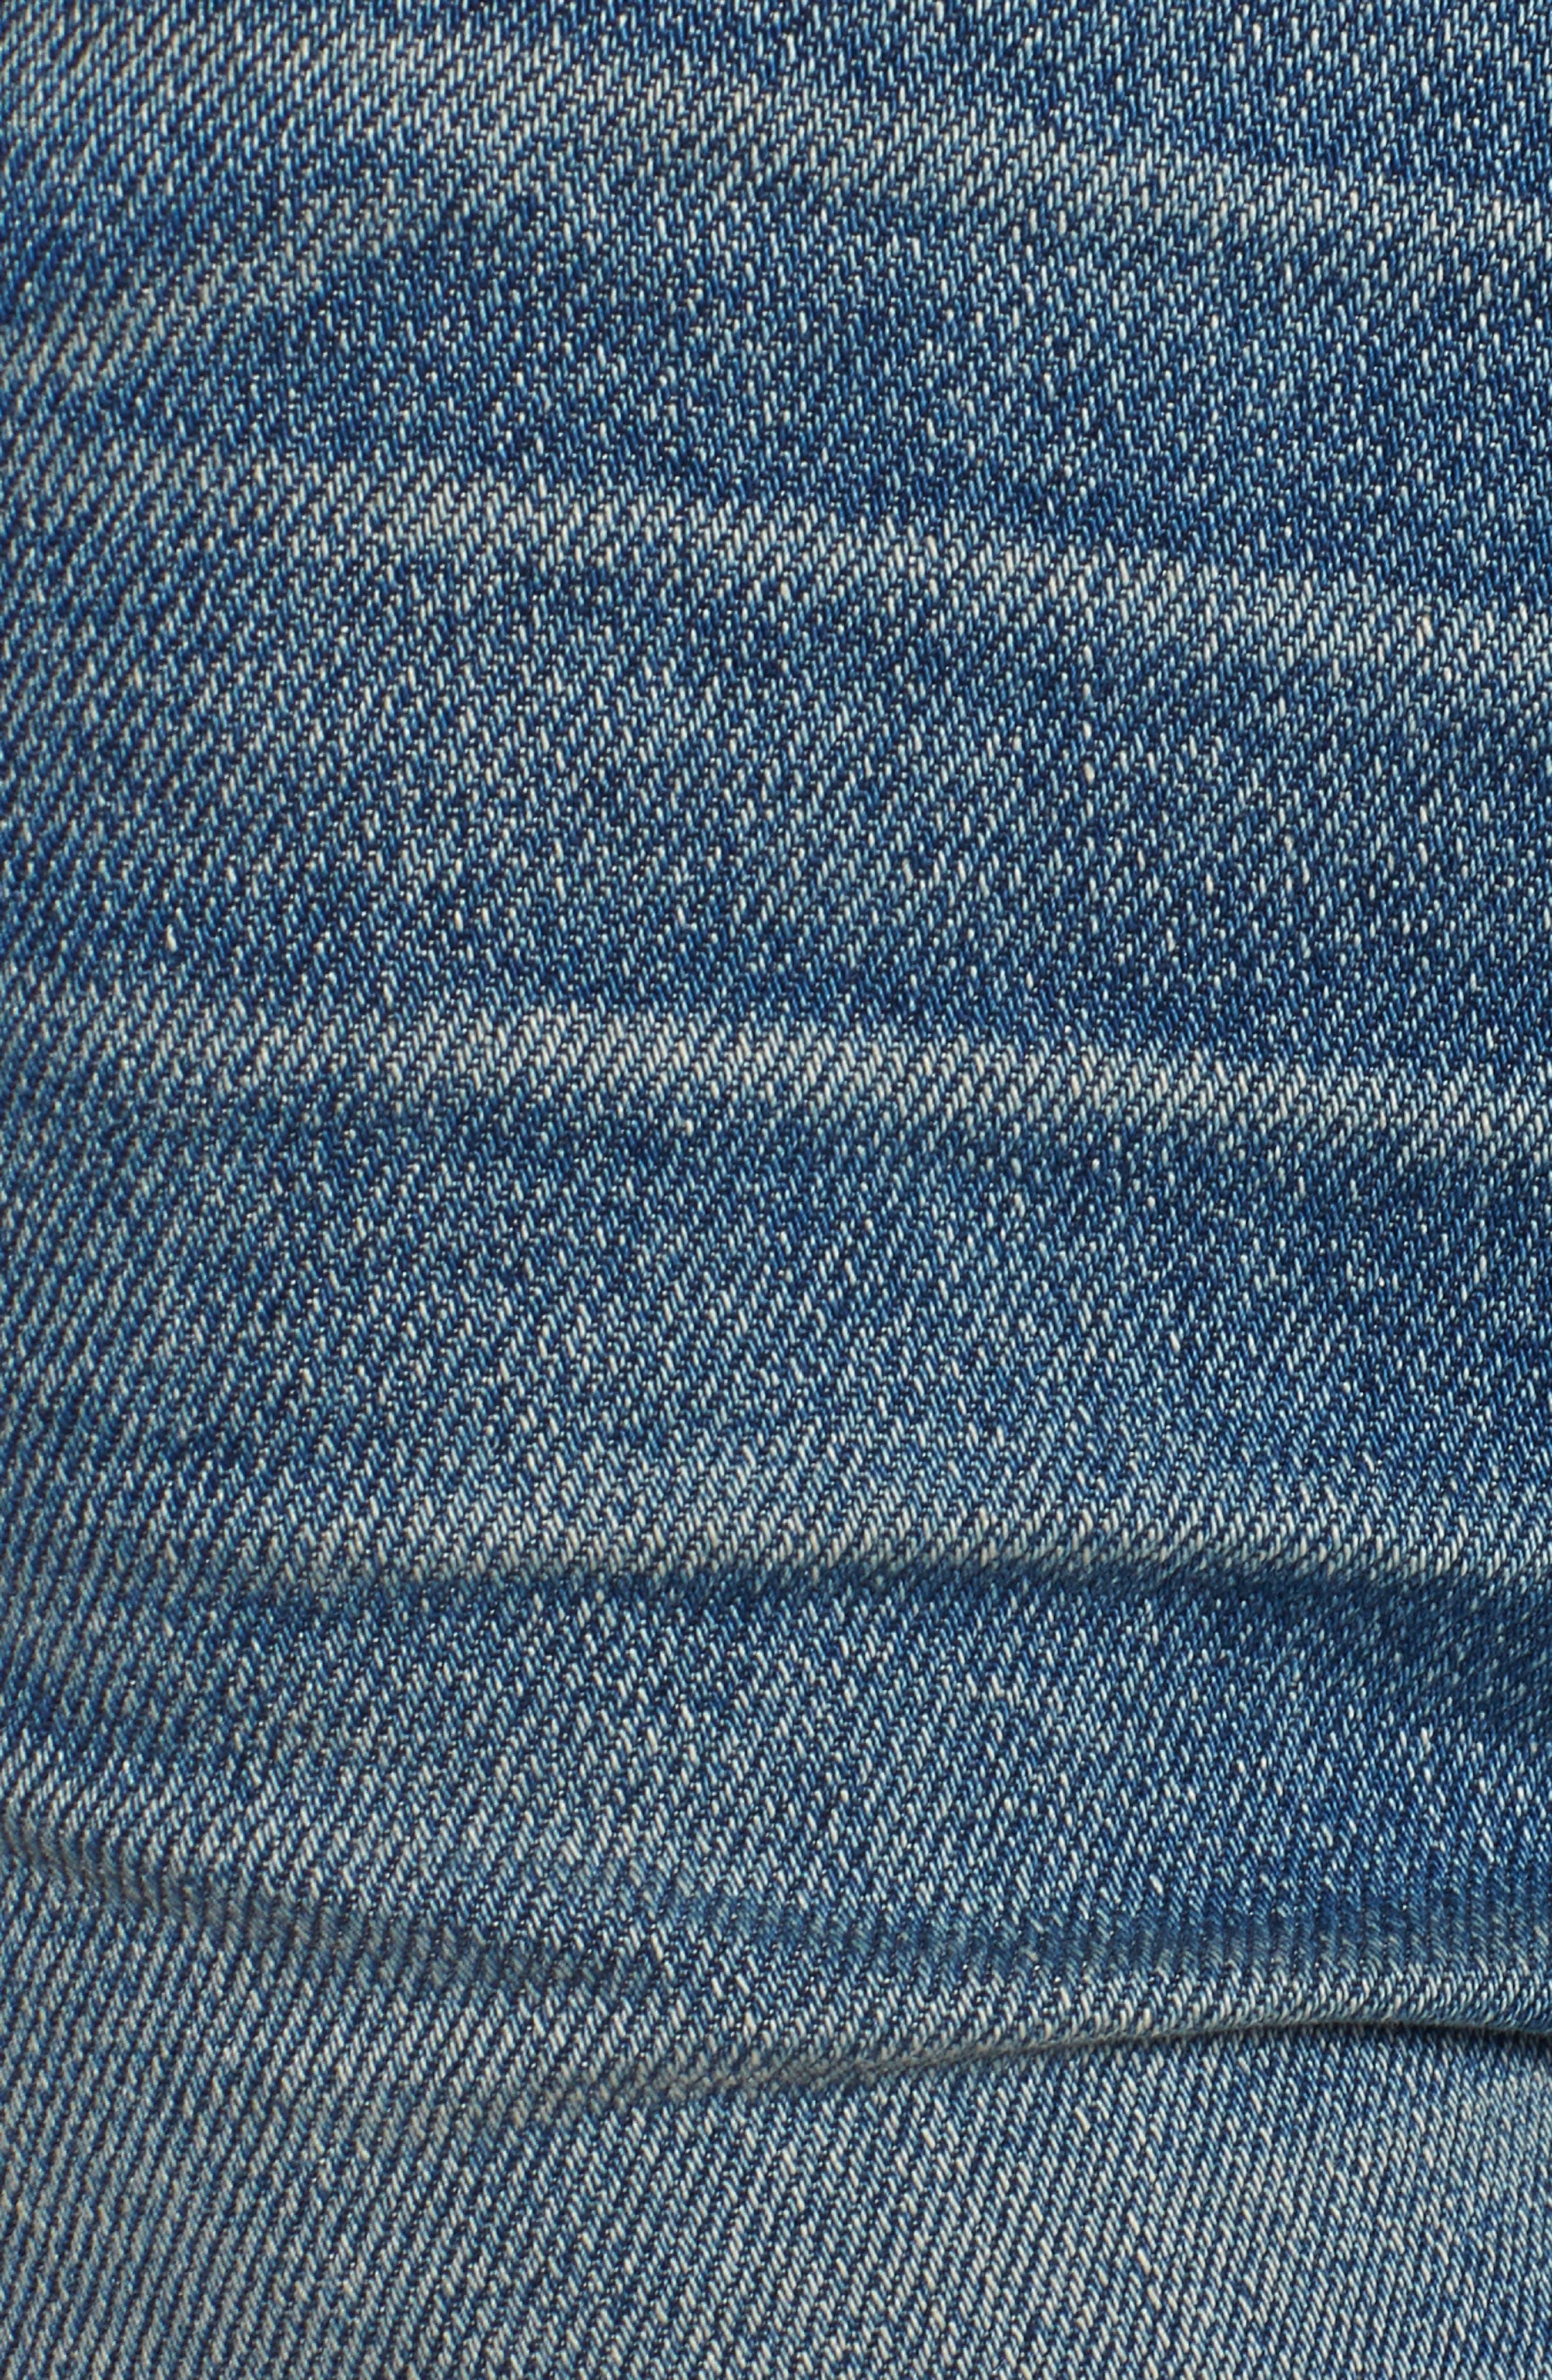 Sade Cutoff Denim Shorts,                             Alternate thumbnail 6, color,                             Sitting Pretty